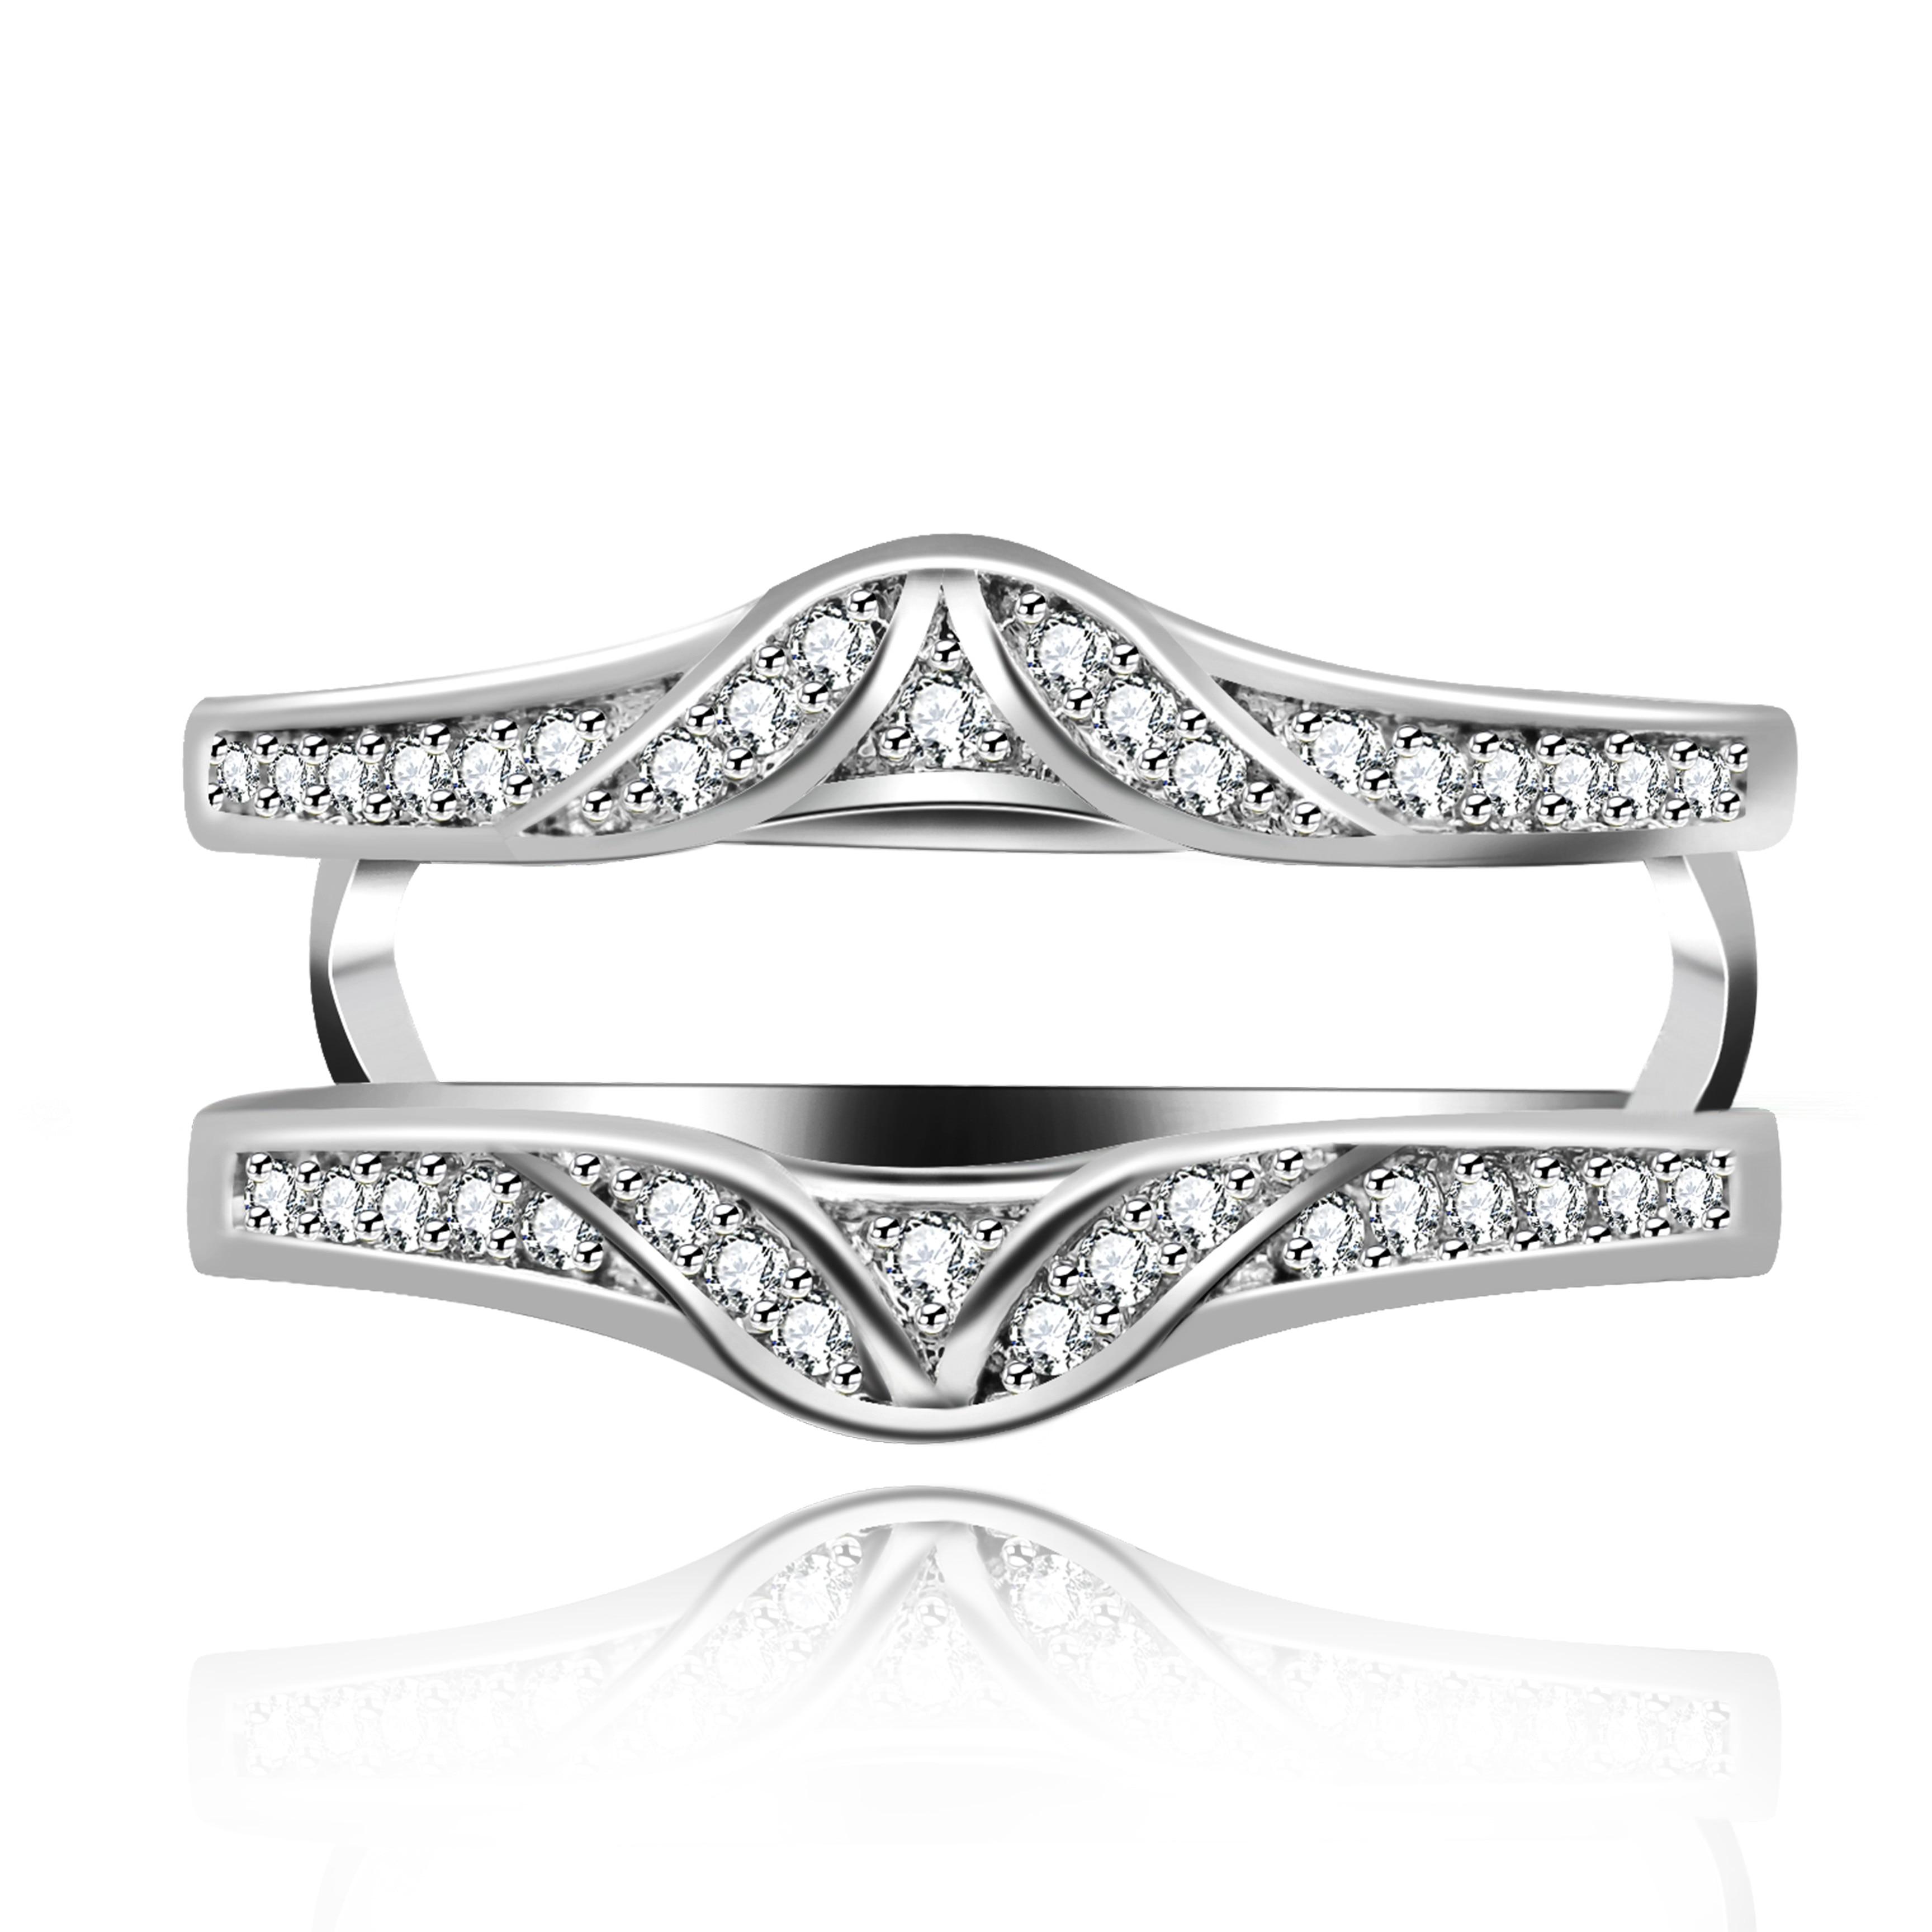 Us Stock White Gold Plated Ring Enhancer For Engagement Wedding